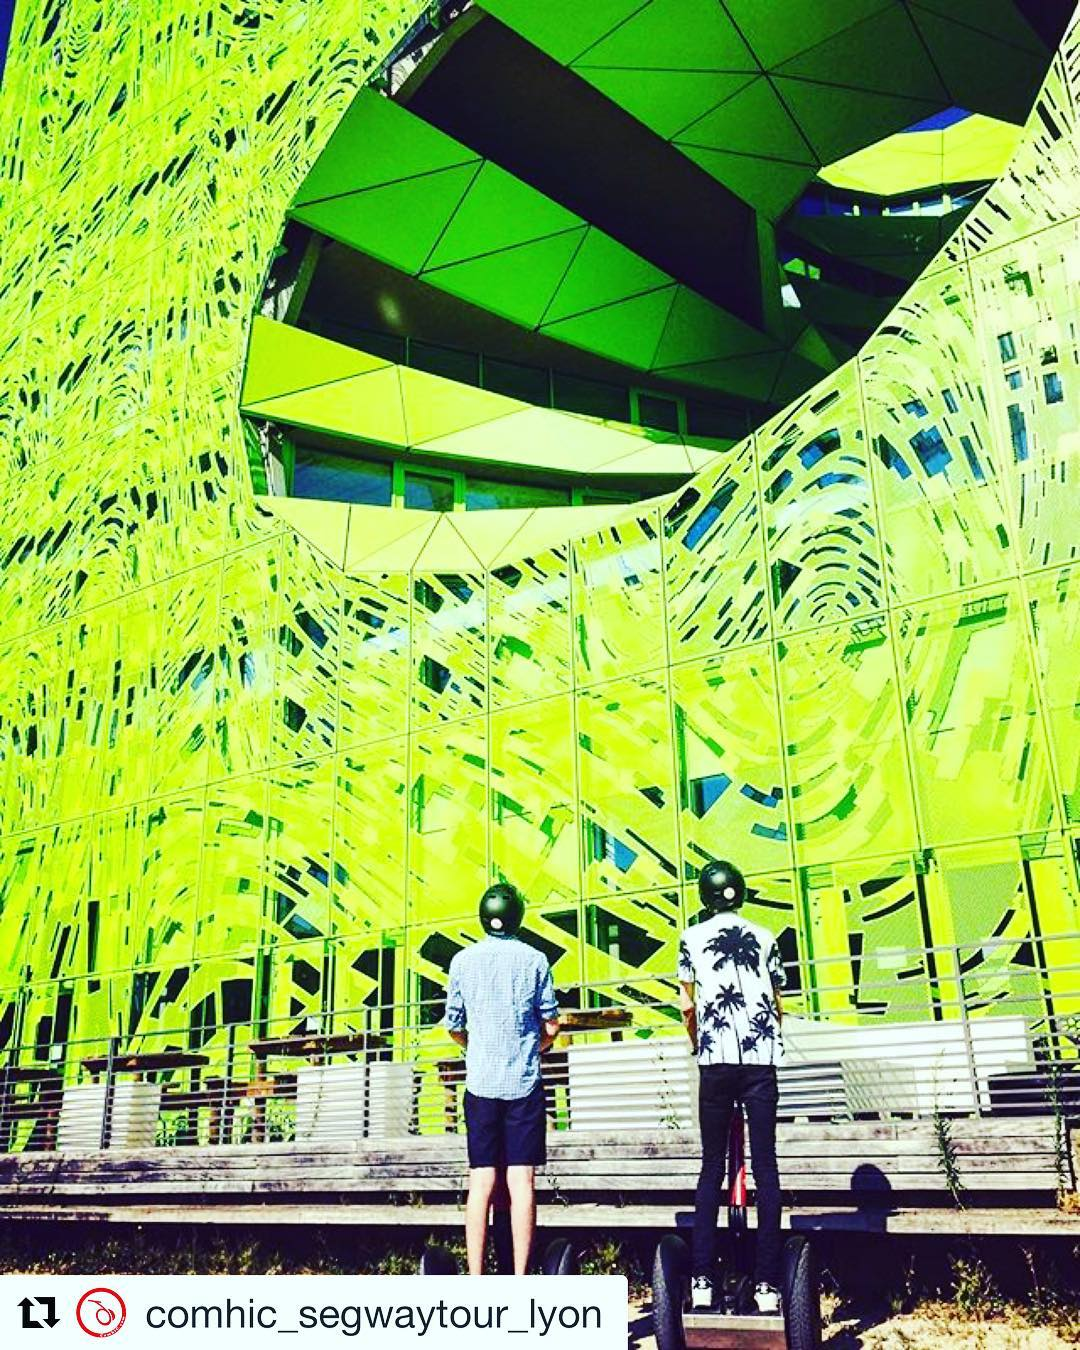 Segway tour of the day is in Lyon France  with this amazing Instagram ready stop on their Segway tour. . . @comhic_segwaytour_lyon ・・・ Balade insolite à Confluence  ... Vous aussi partagez vos coins préférés #️⃣📸 ...